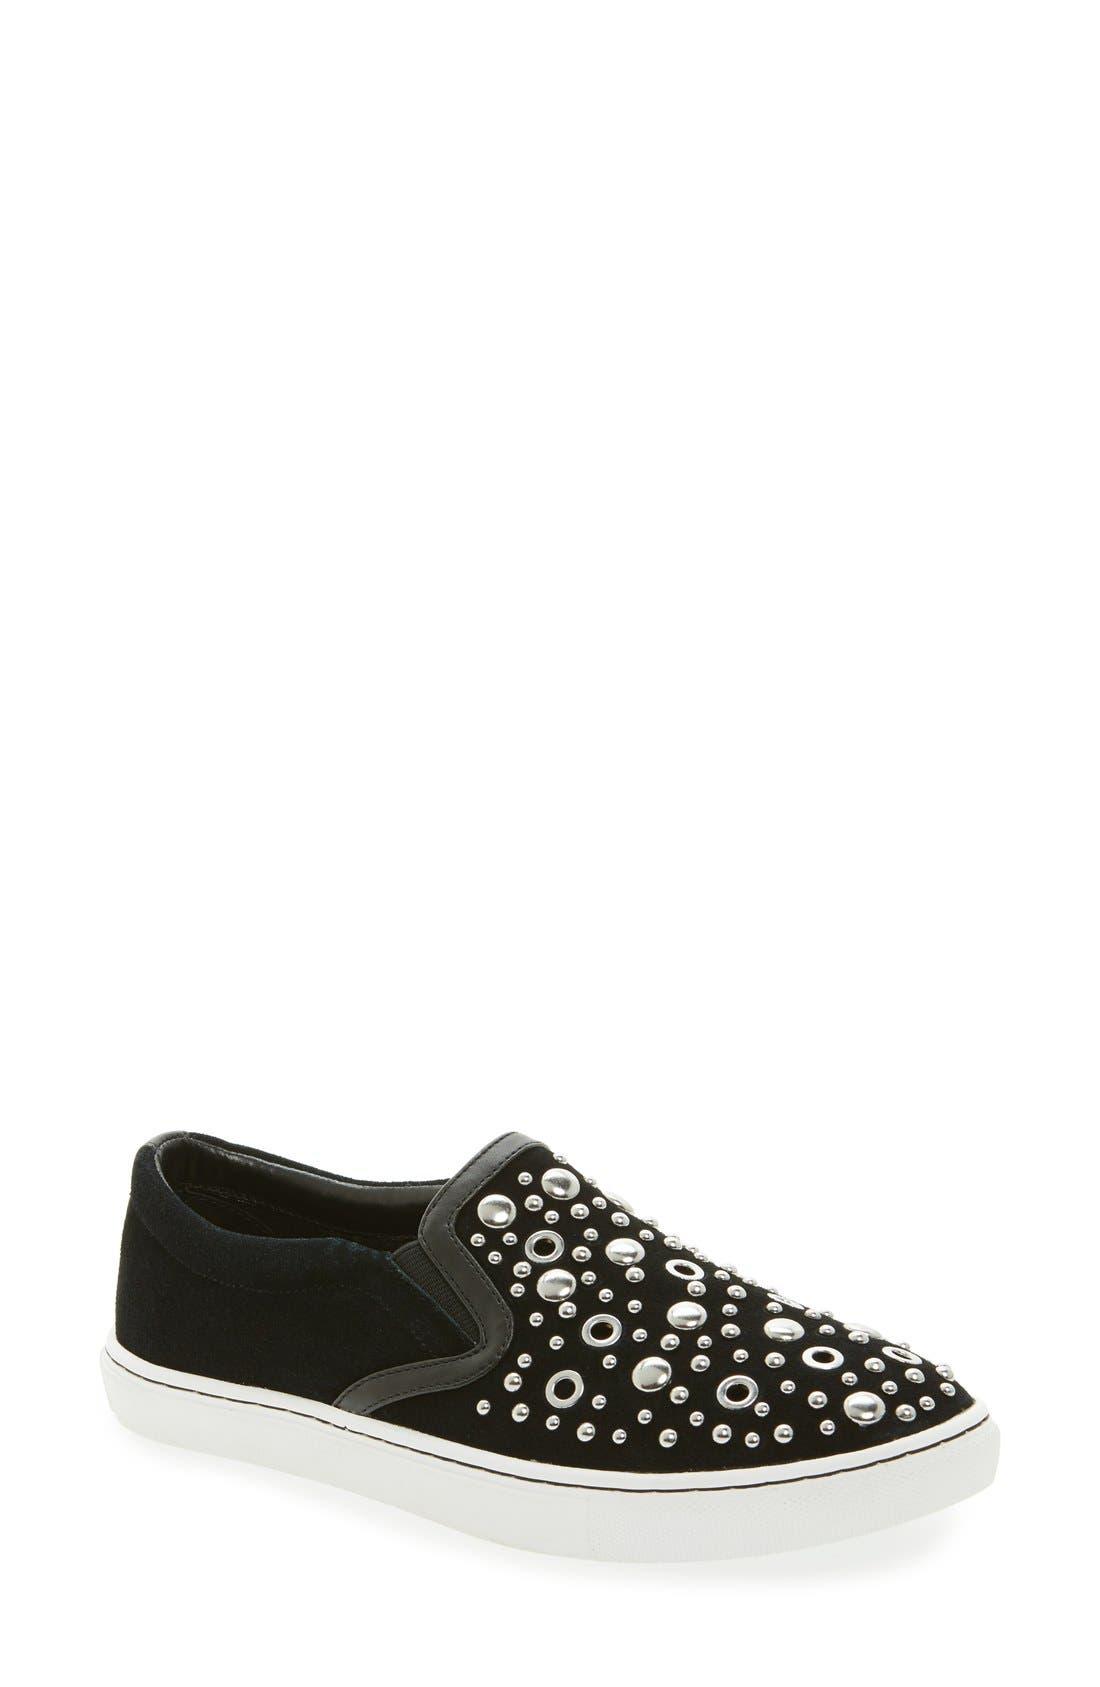 Paven Embellished Slip-On Sneaker,                             Main thumbnail 1, color,                             Black